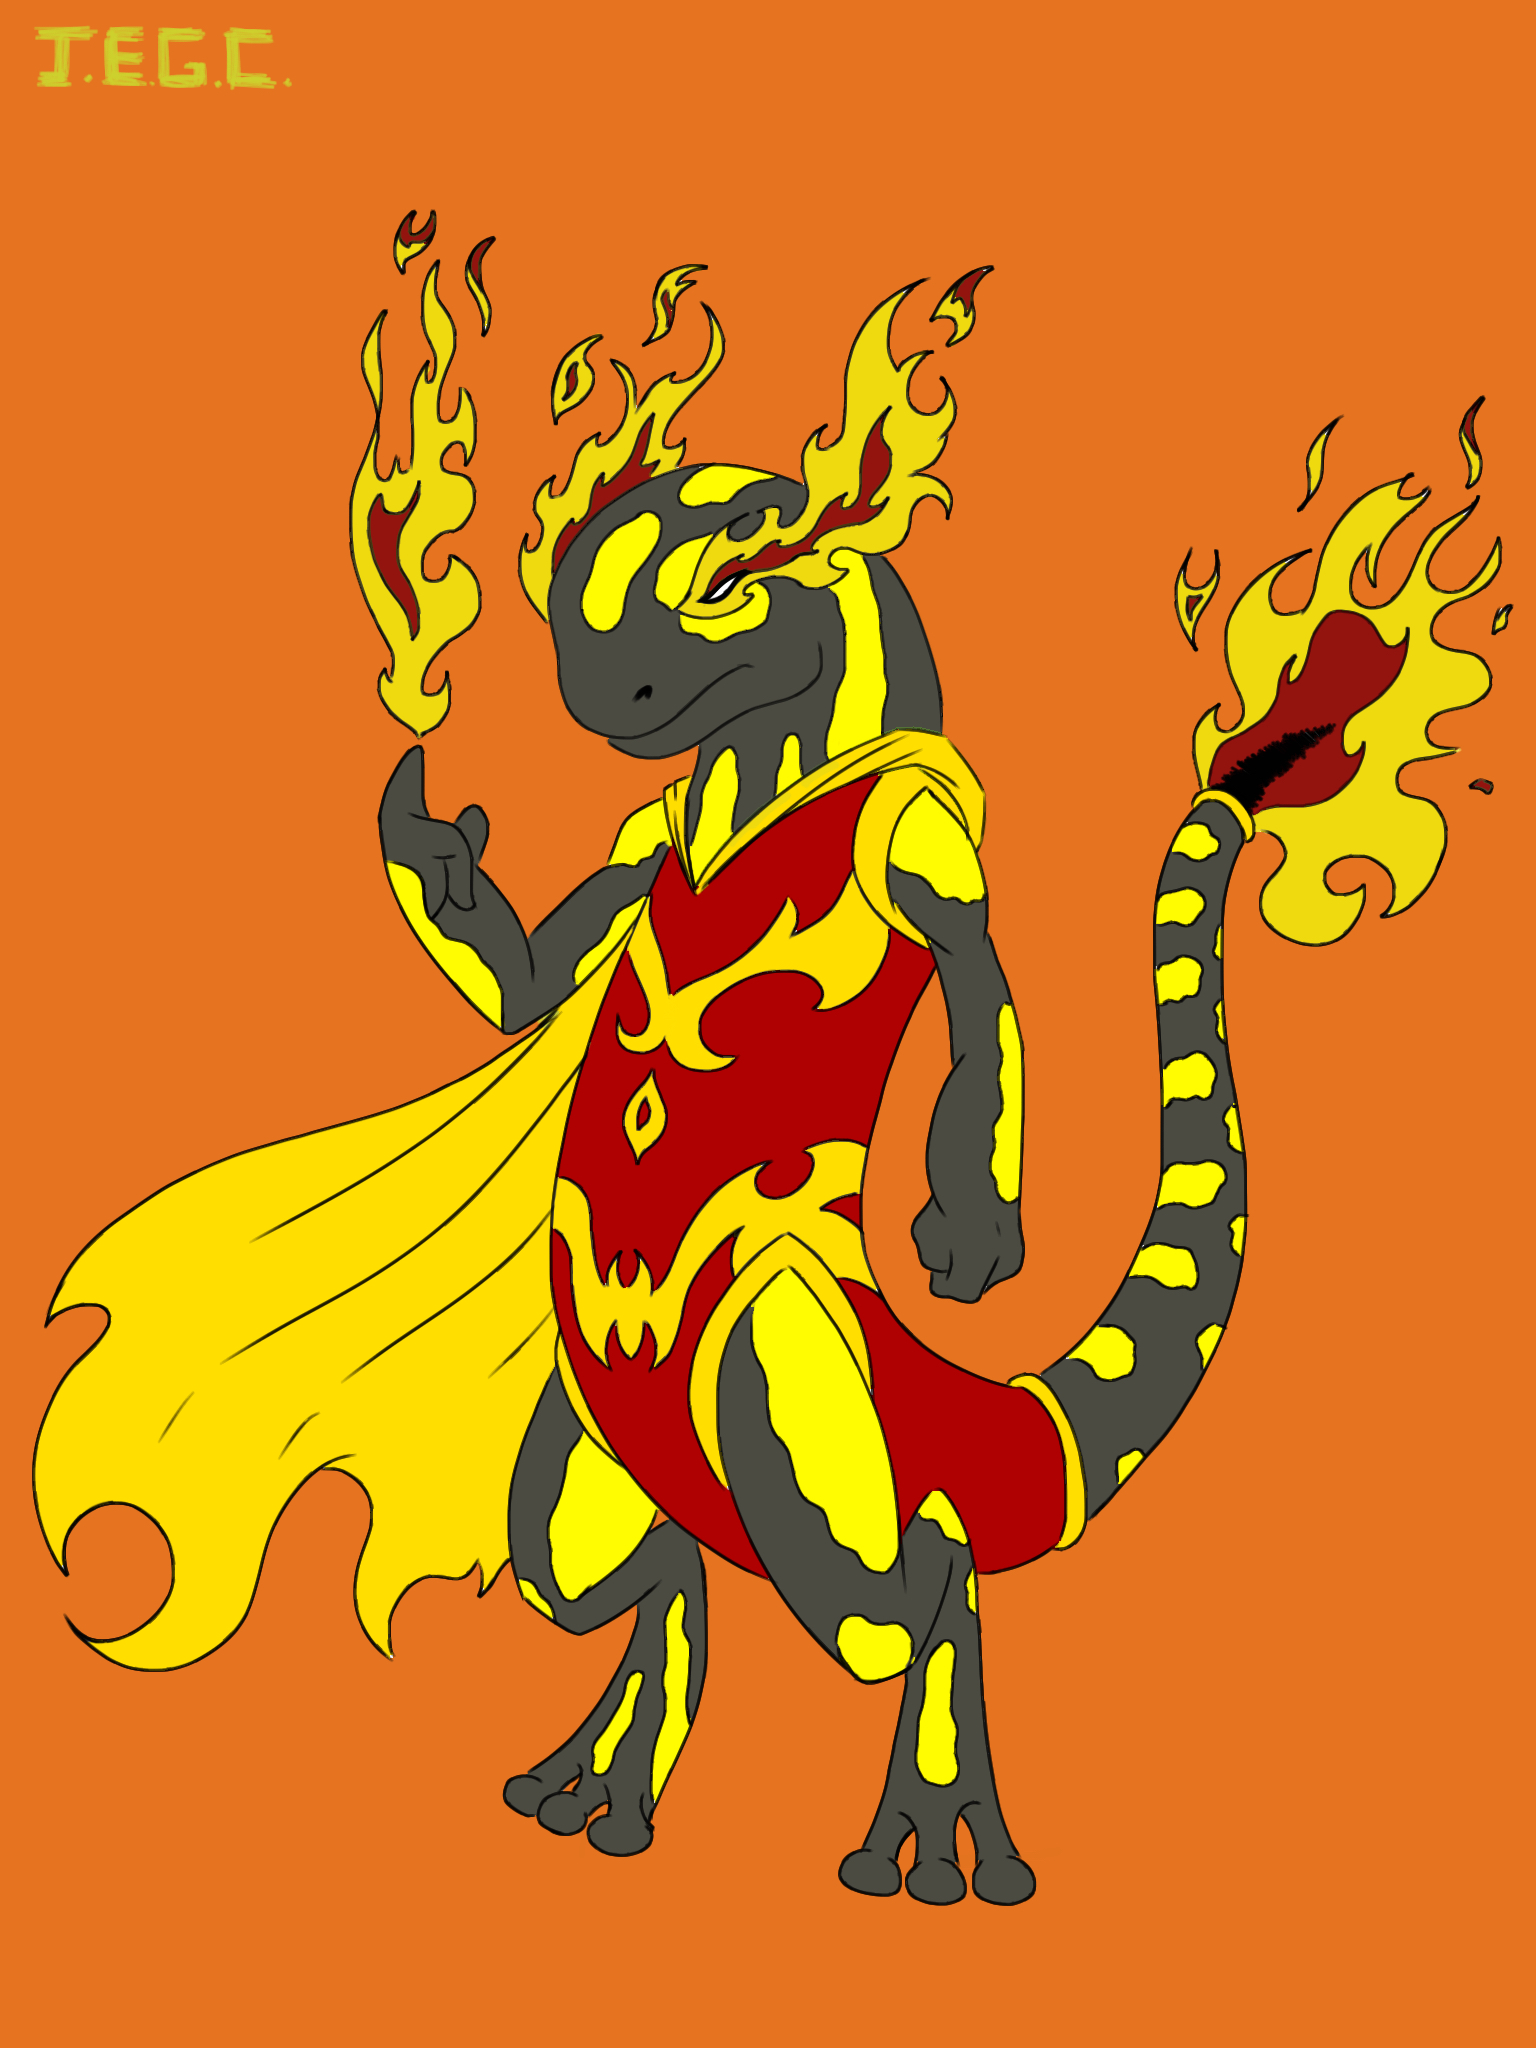 Fire slamander superhero  by jjjjoooo1234